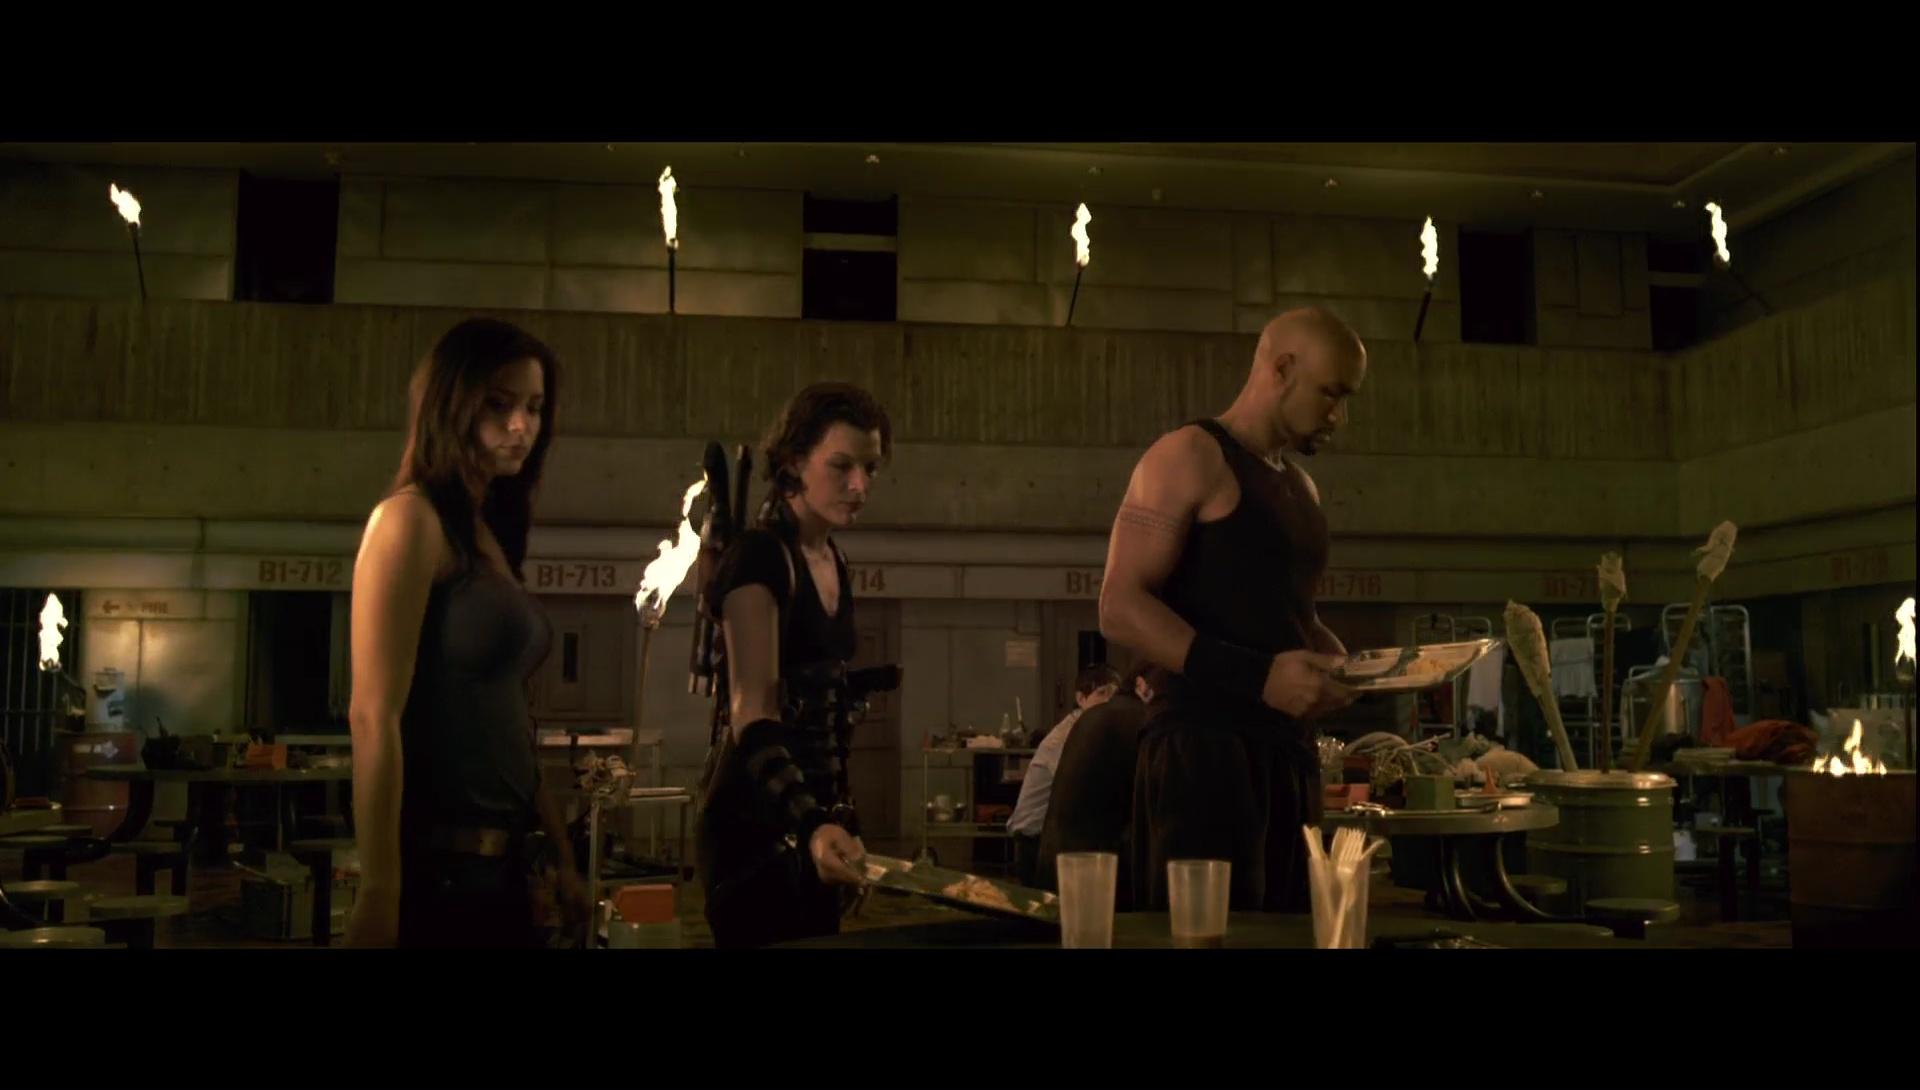 Resident Evil 4 La Resurreccion HD1080p Lat-Cast-Ing 5.1 (2010)